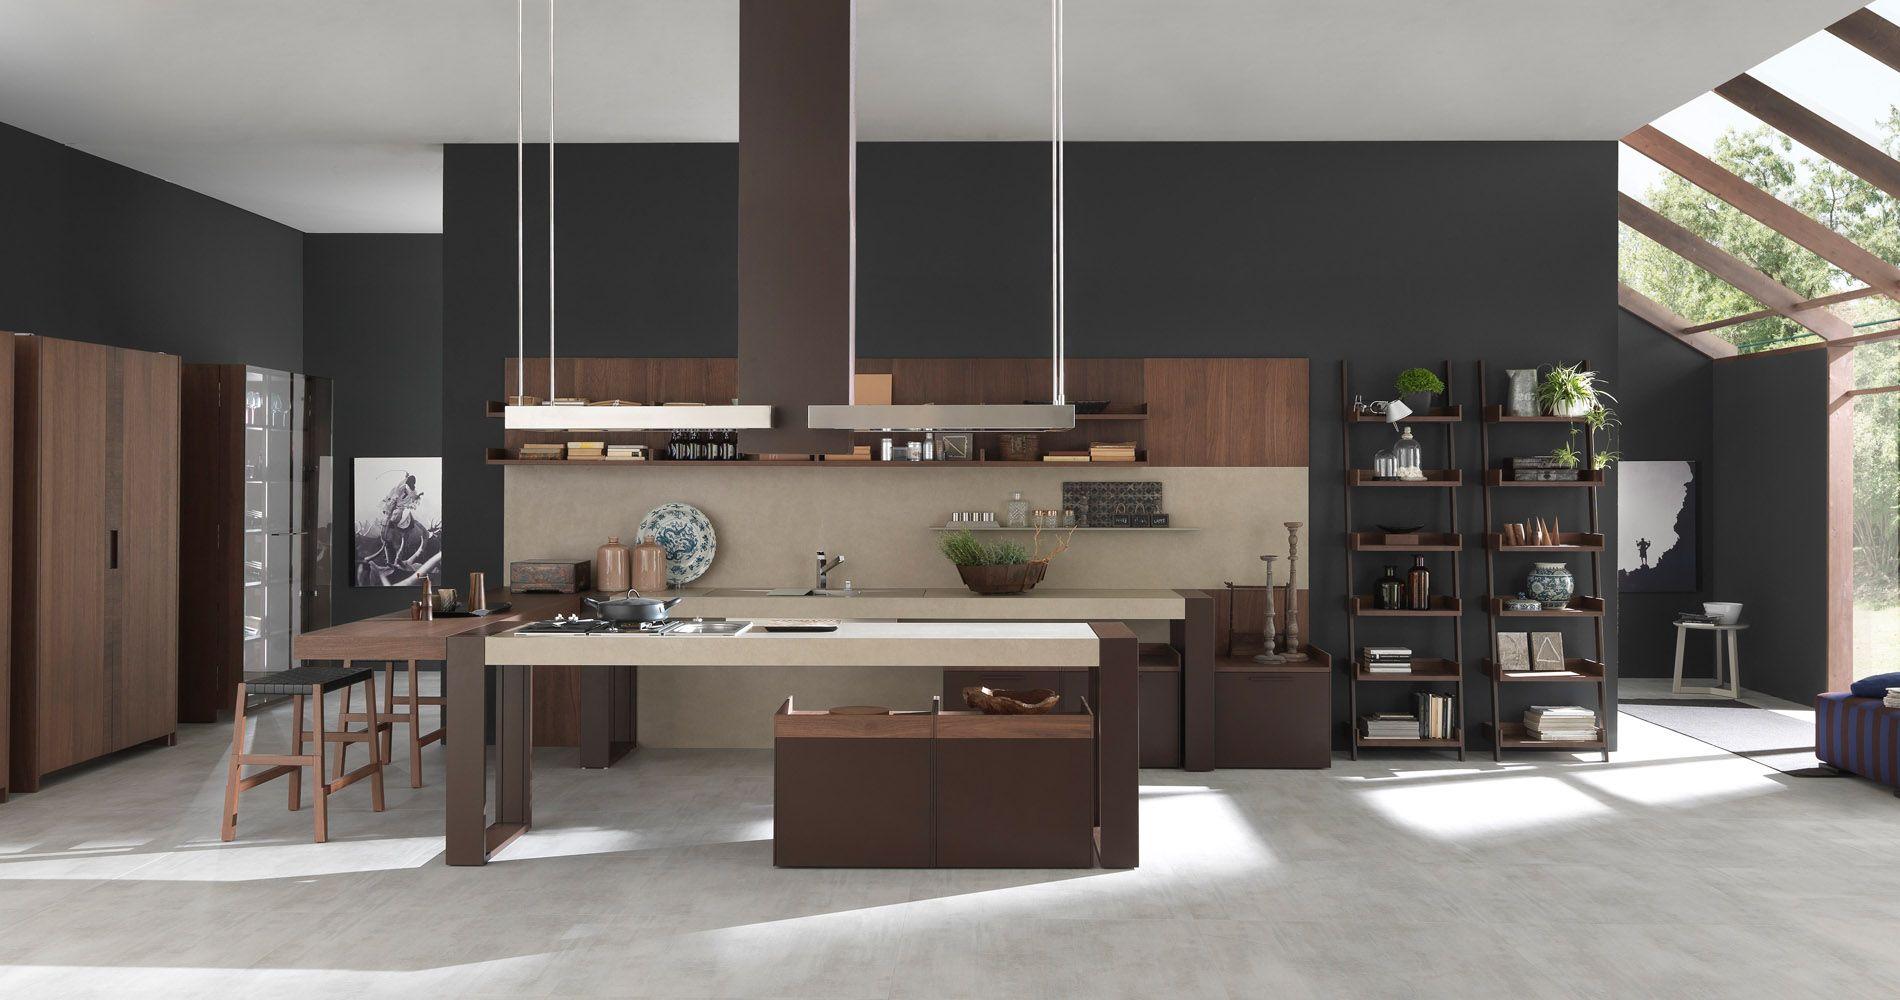 pedini kitchen design italian german european modern kitchens contemporary kitchen cabinetry